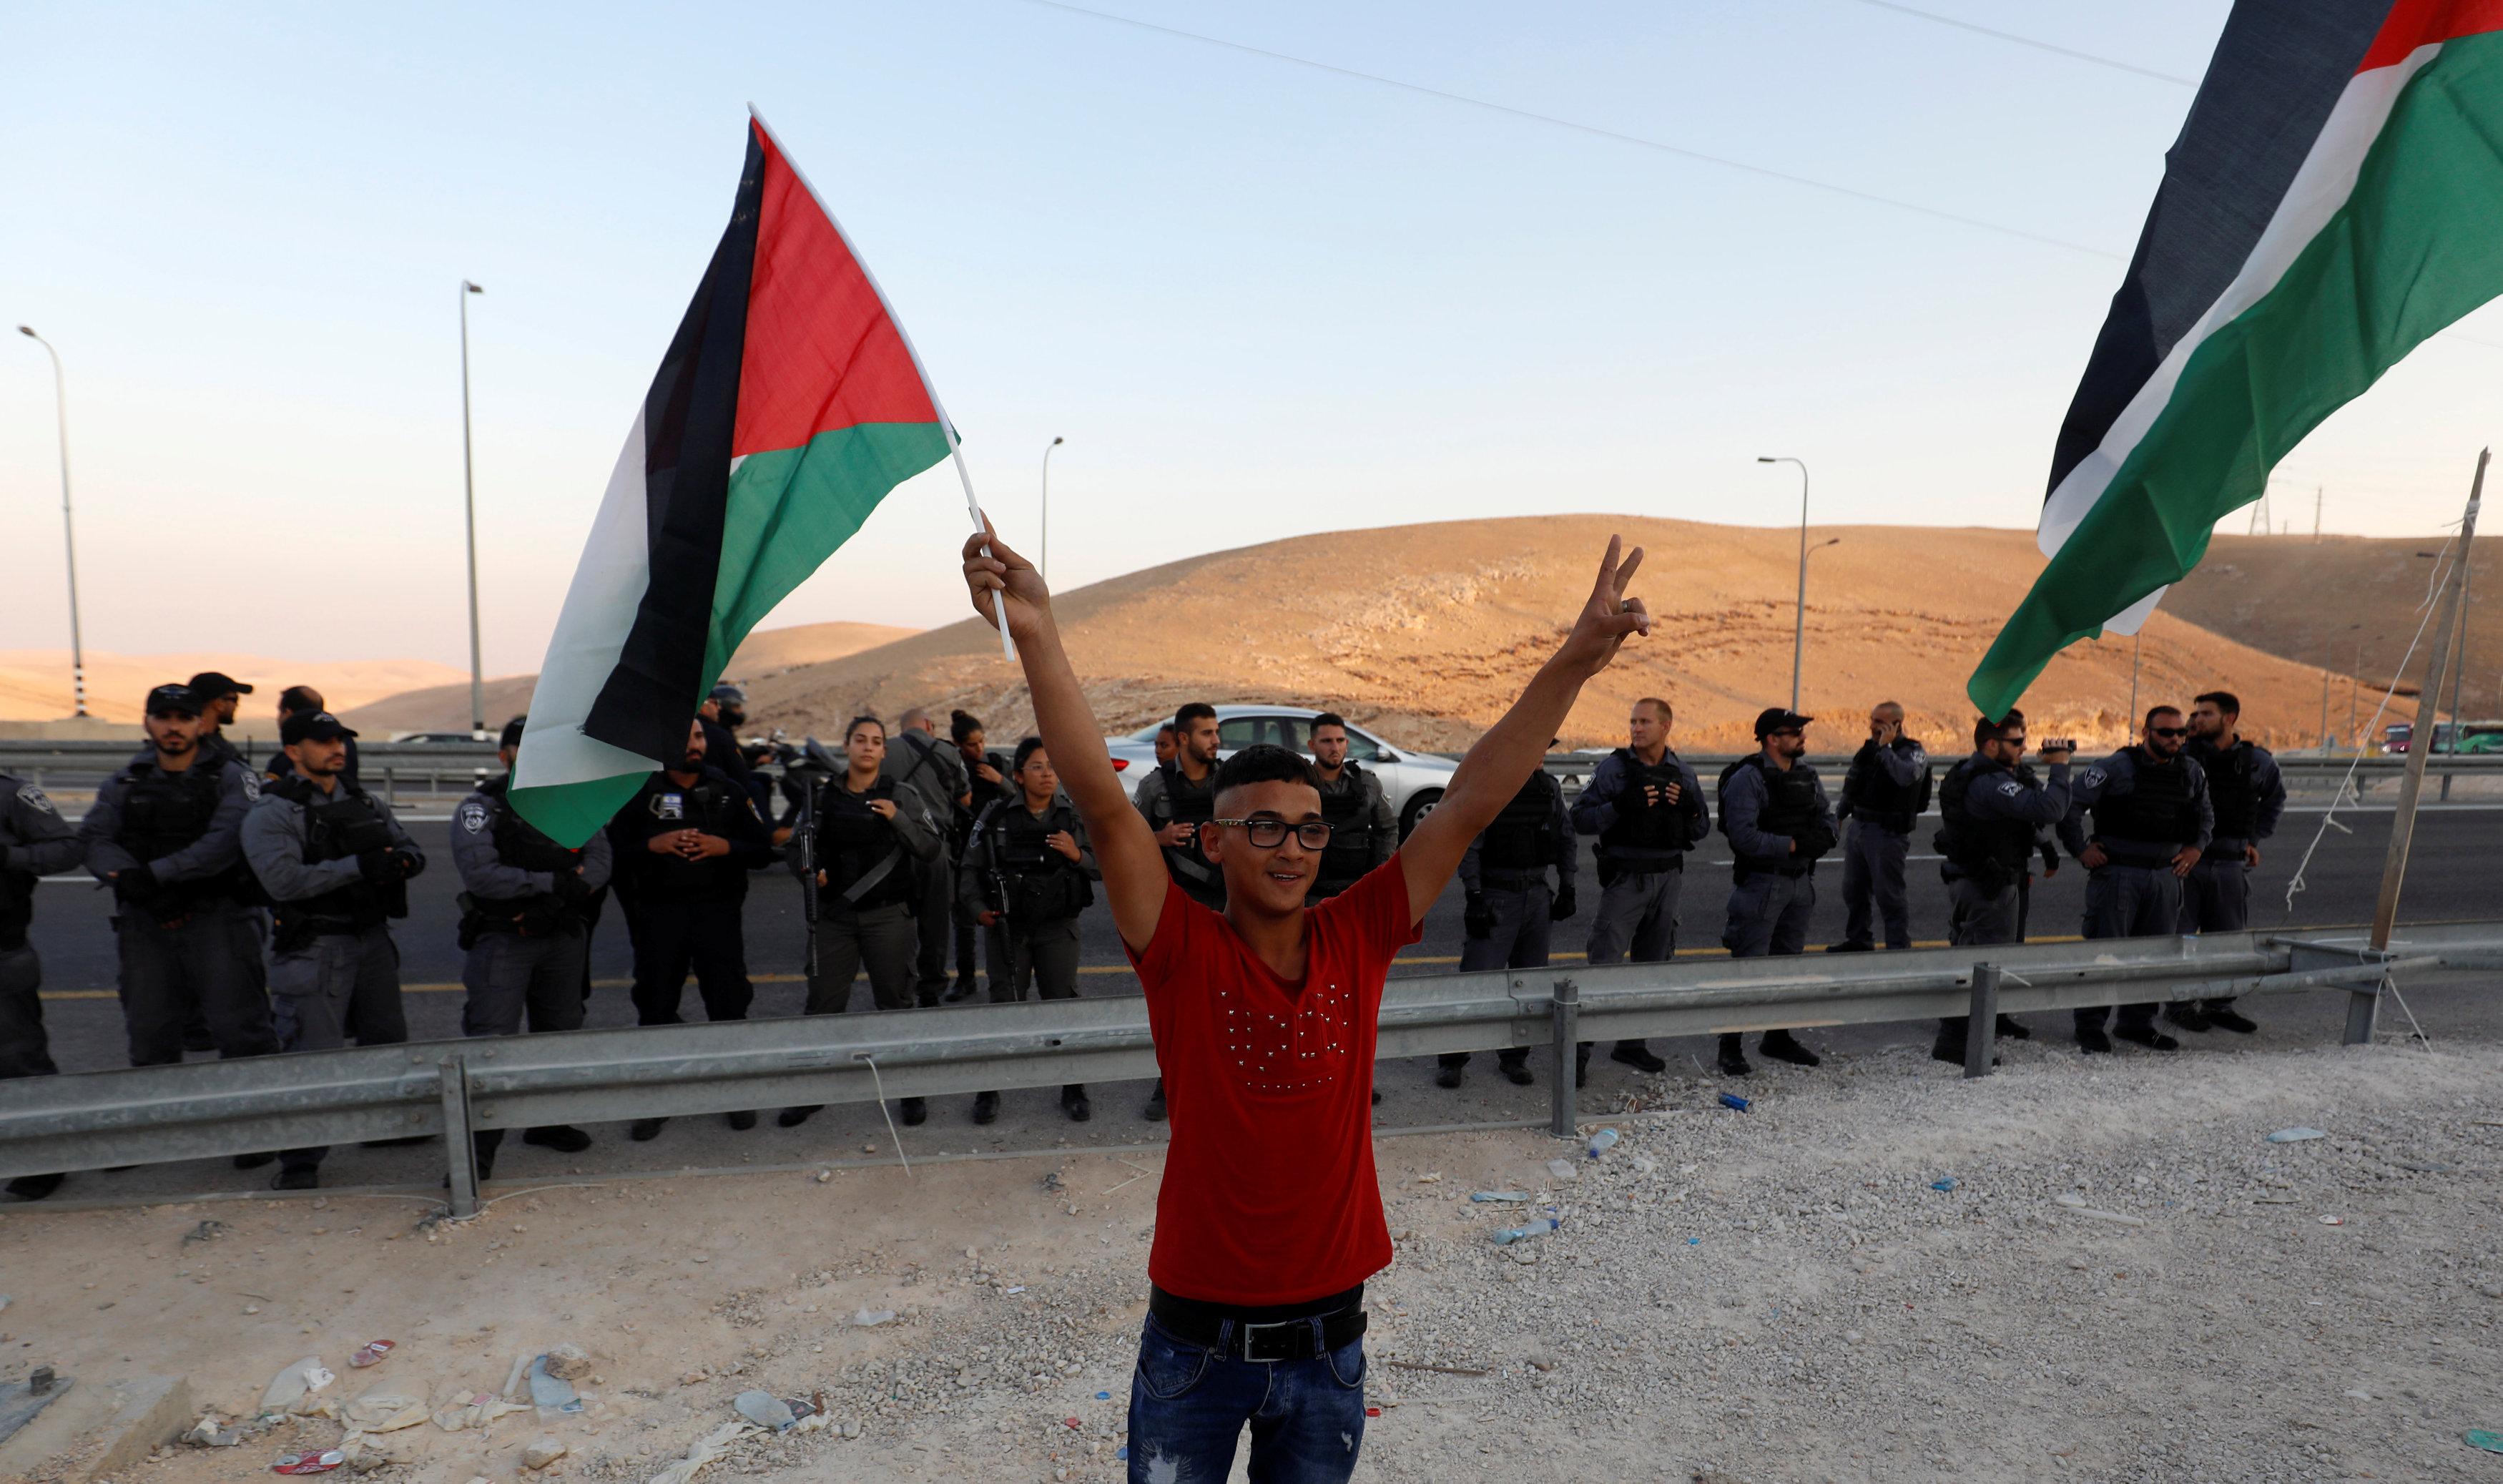 washingtonpost.com - David Ignatius - How peace keeps receding in the Middle East